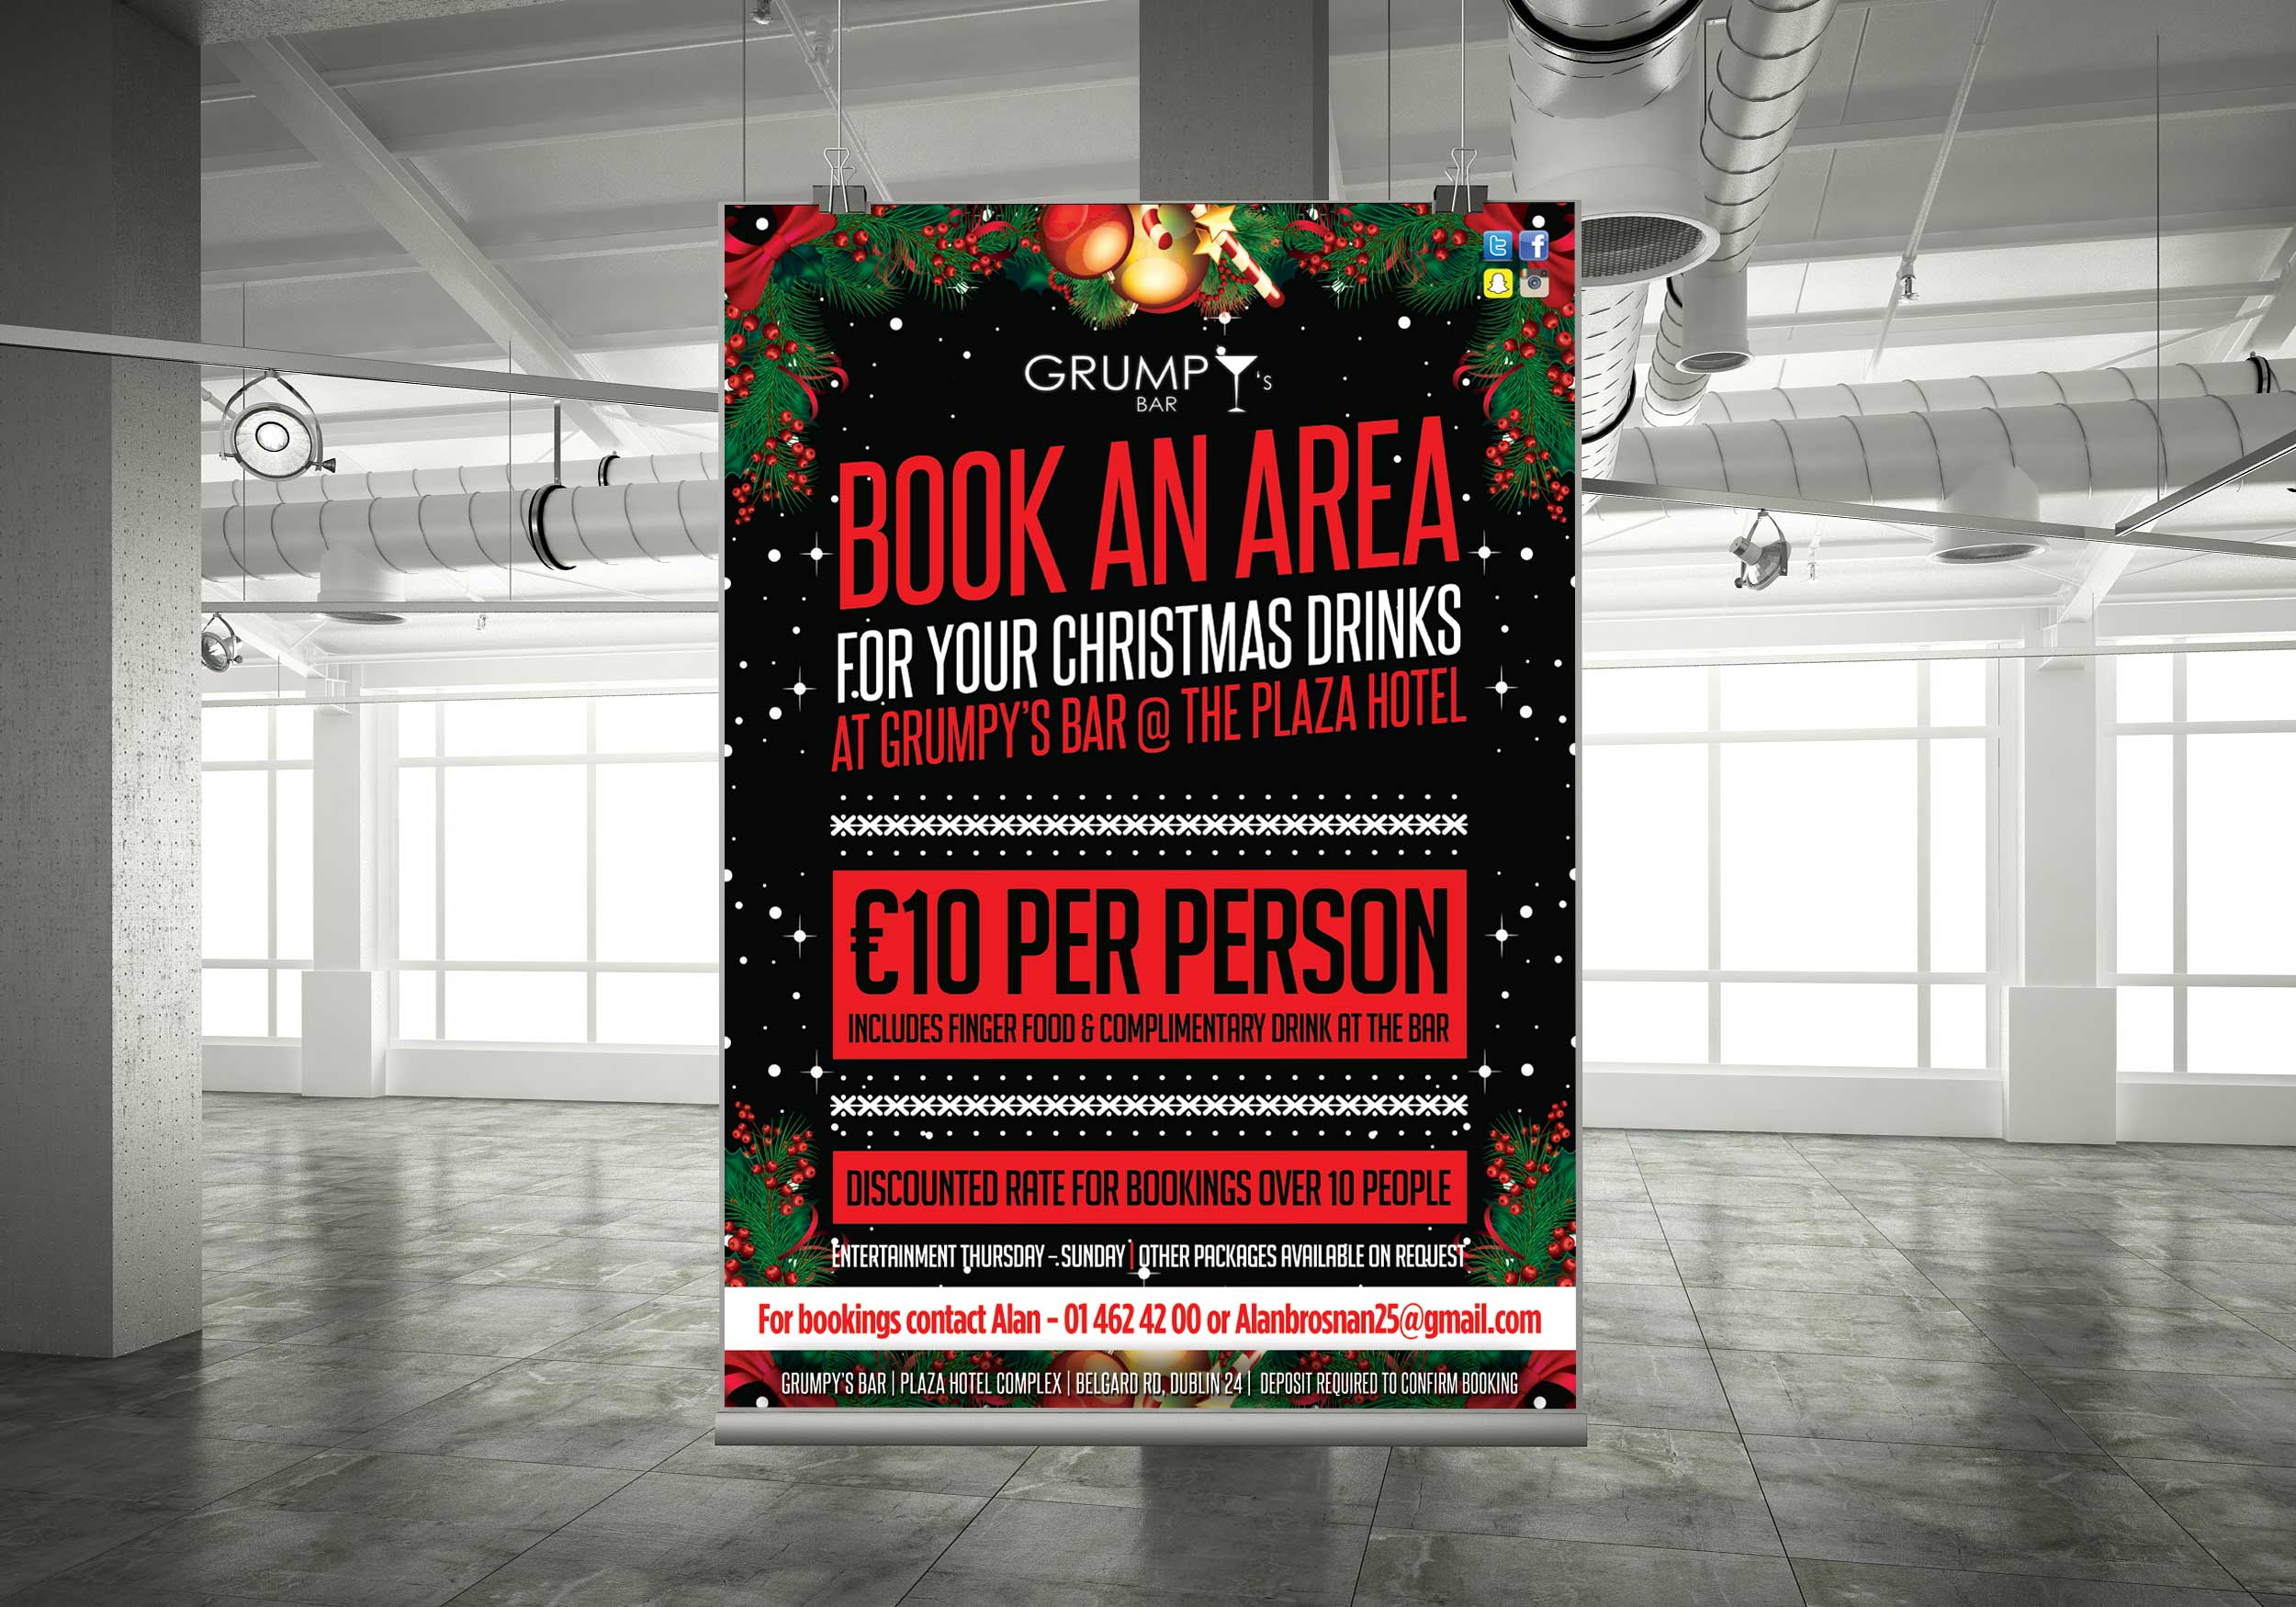 Poster design dublin - Christmas Party Poster Design For Dublin Pubs Grumpys Tallaght Digital Marketing Consultant Graphic Design Studio Web Design Dublin Printers Dublin